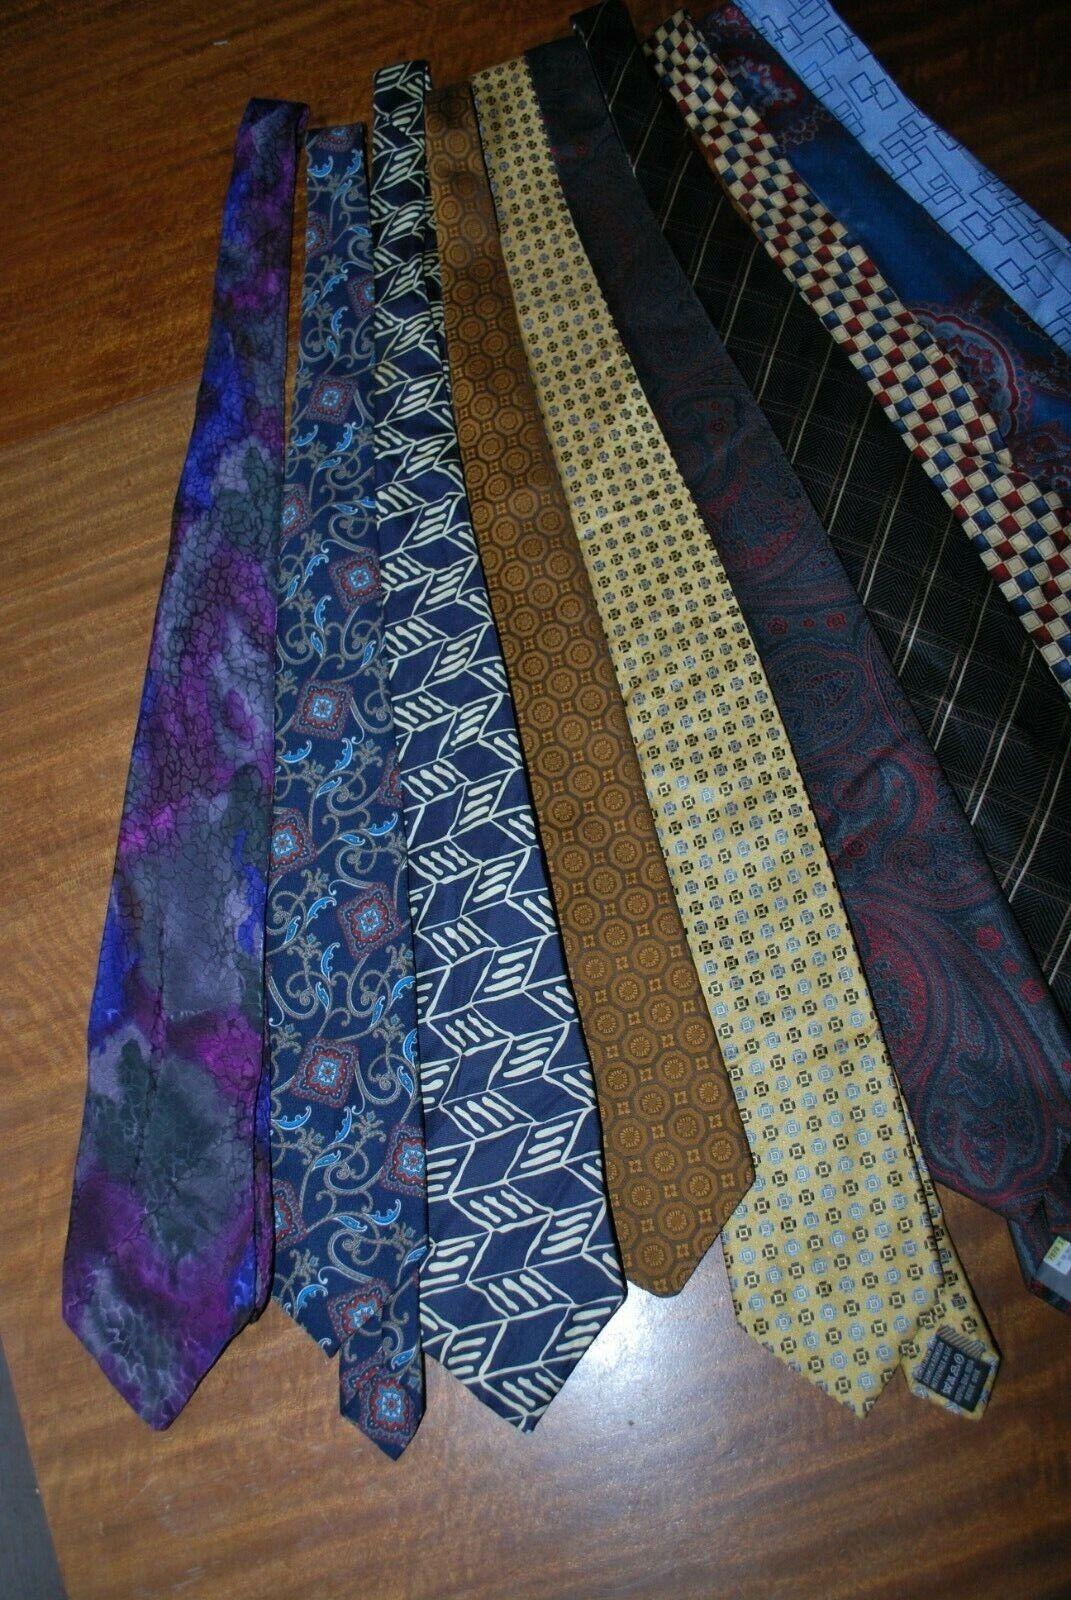 10 x various coloured patterned Tie's job lot bulk buy 11